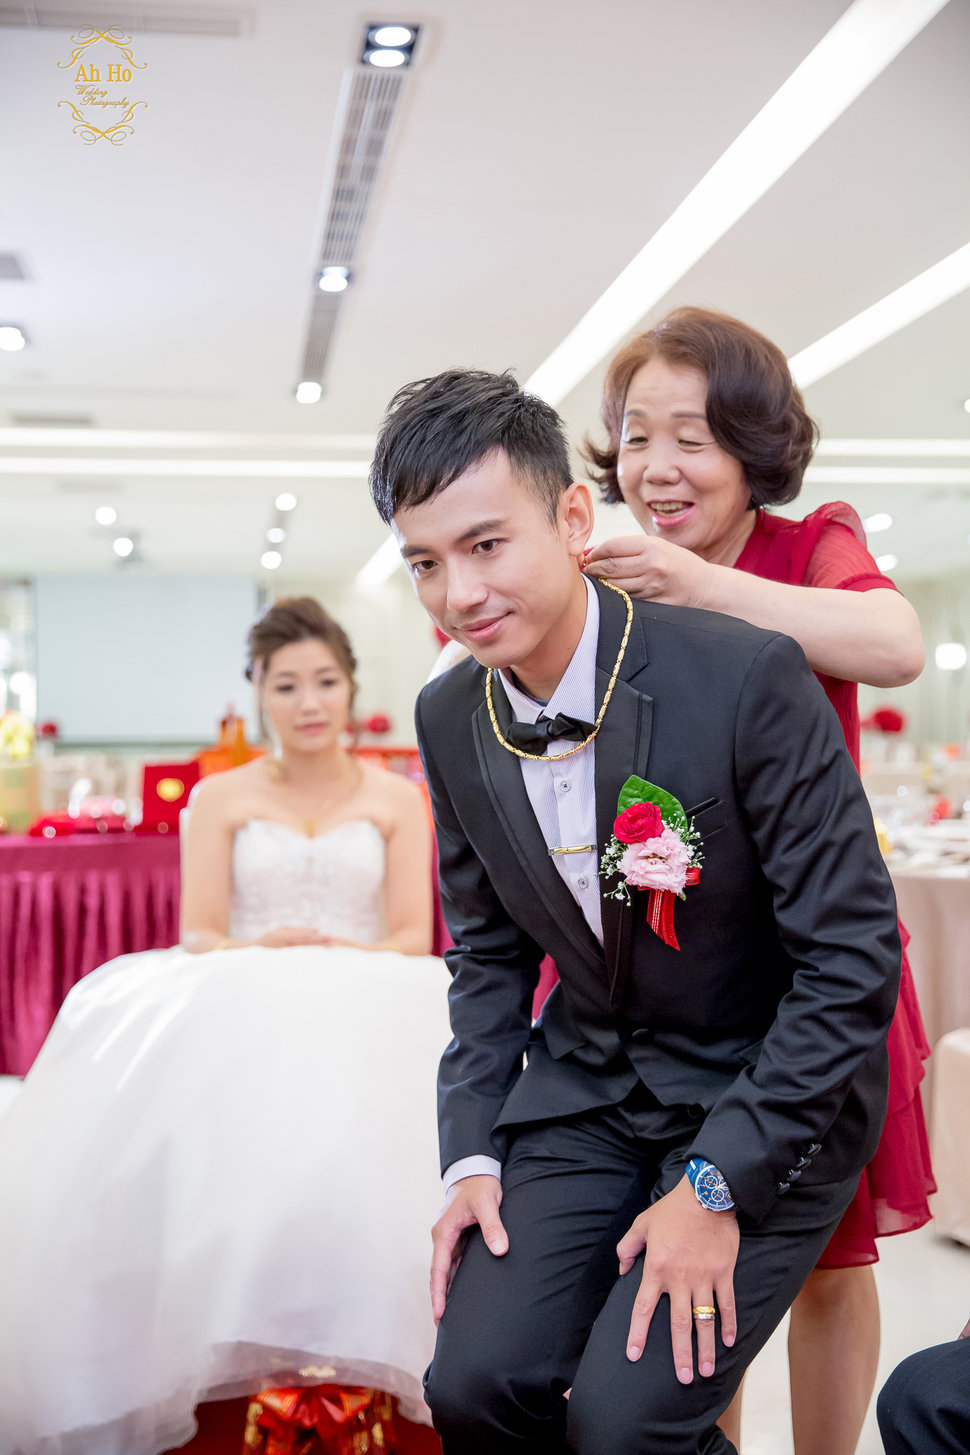 AhHo Wedding TEL-0937797161 lineID-chiupeiho (83 - 411) - AhHoWedding/阿河婚攝《結婚吧》